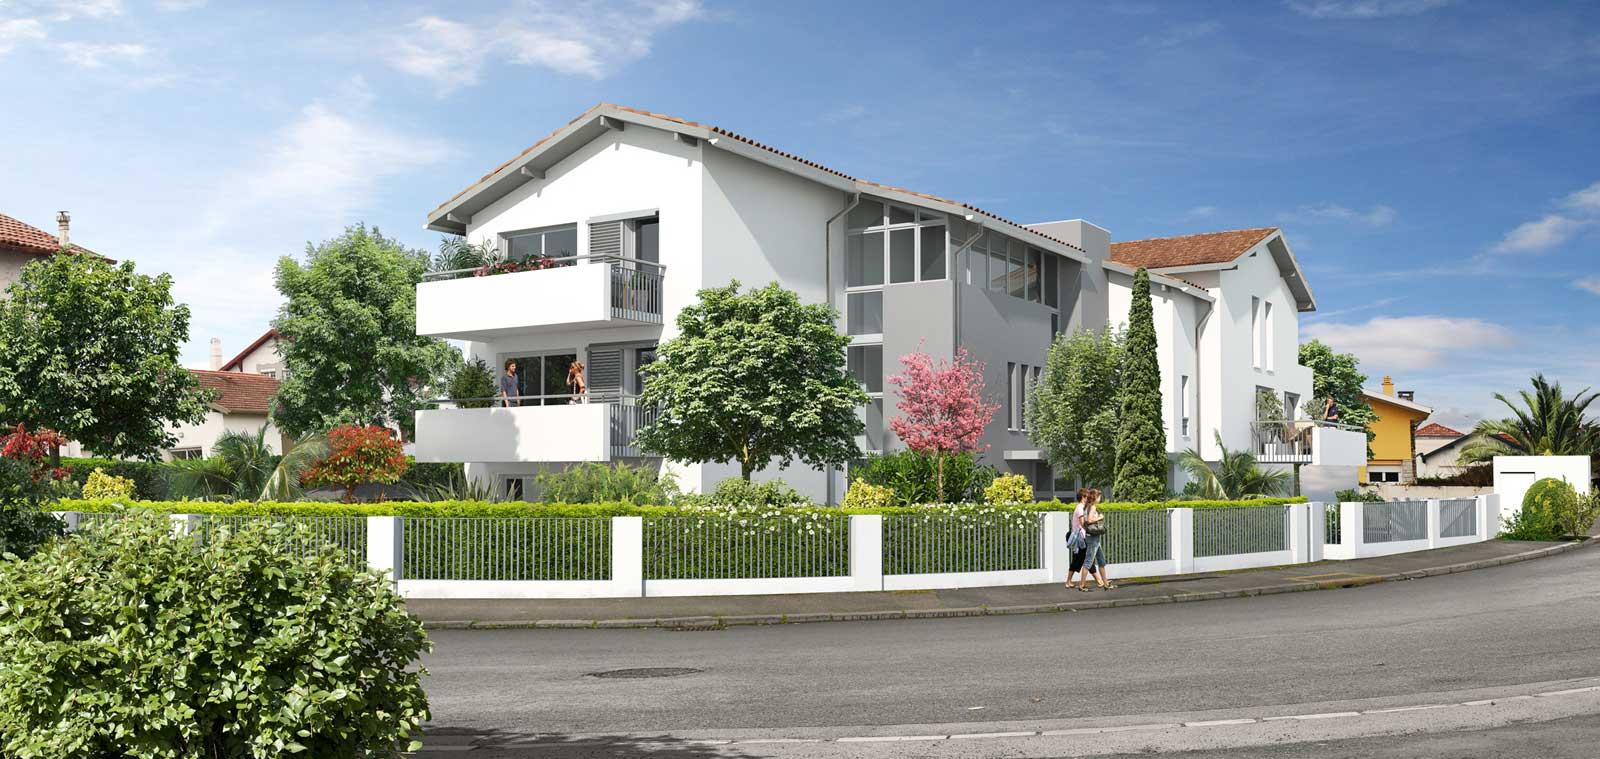 aog architecte biarritz paloma 03 aog architectes. Black Bedroom Furniture Sets. Home Design Ideas